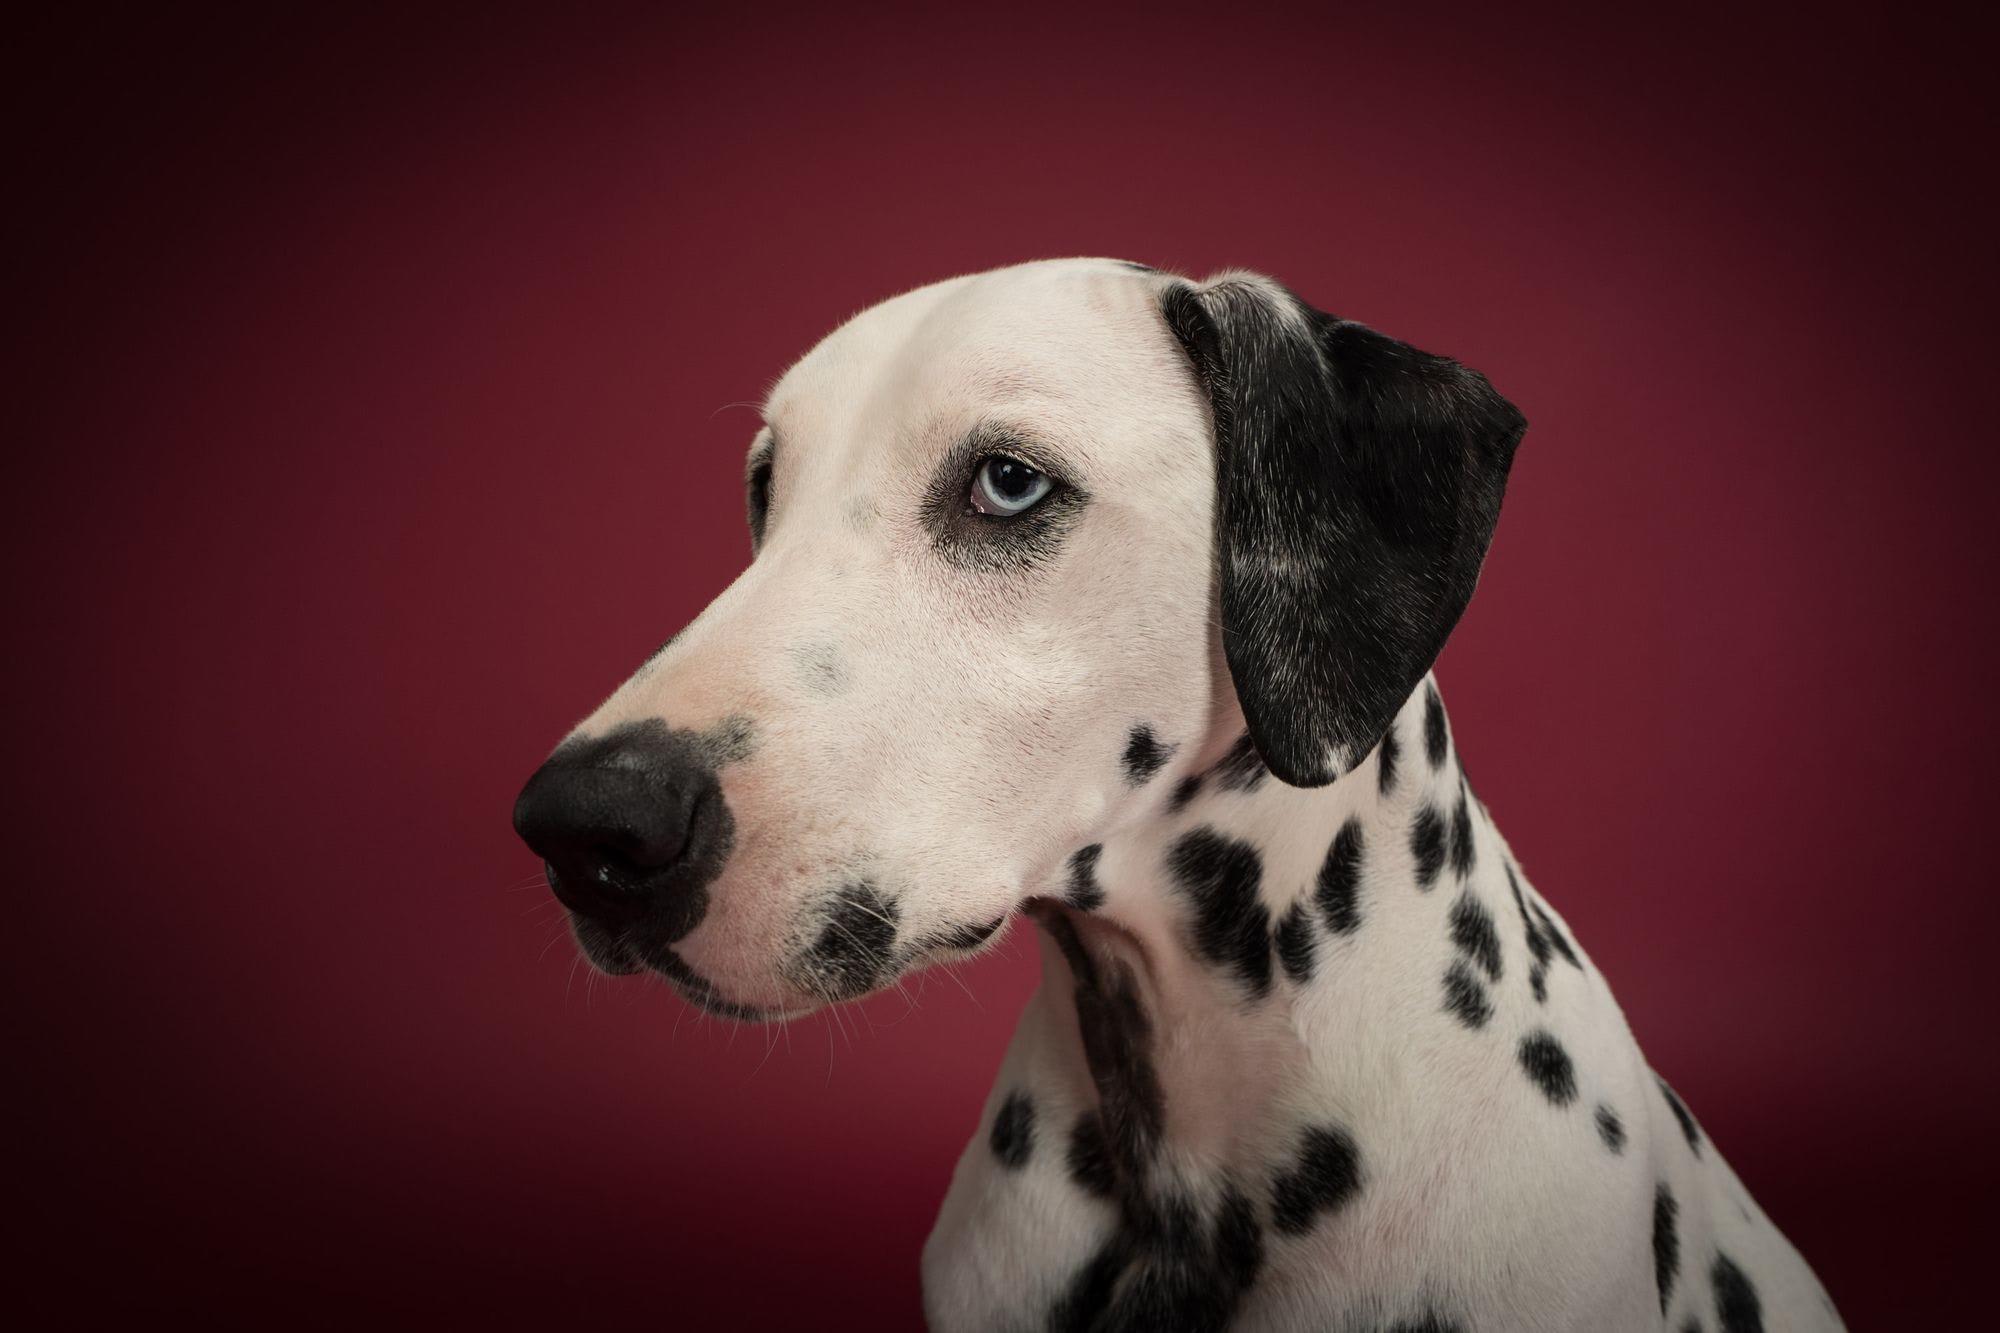 Charlie the Dalmatian in profile